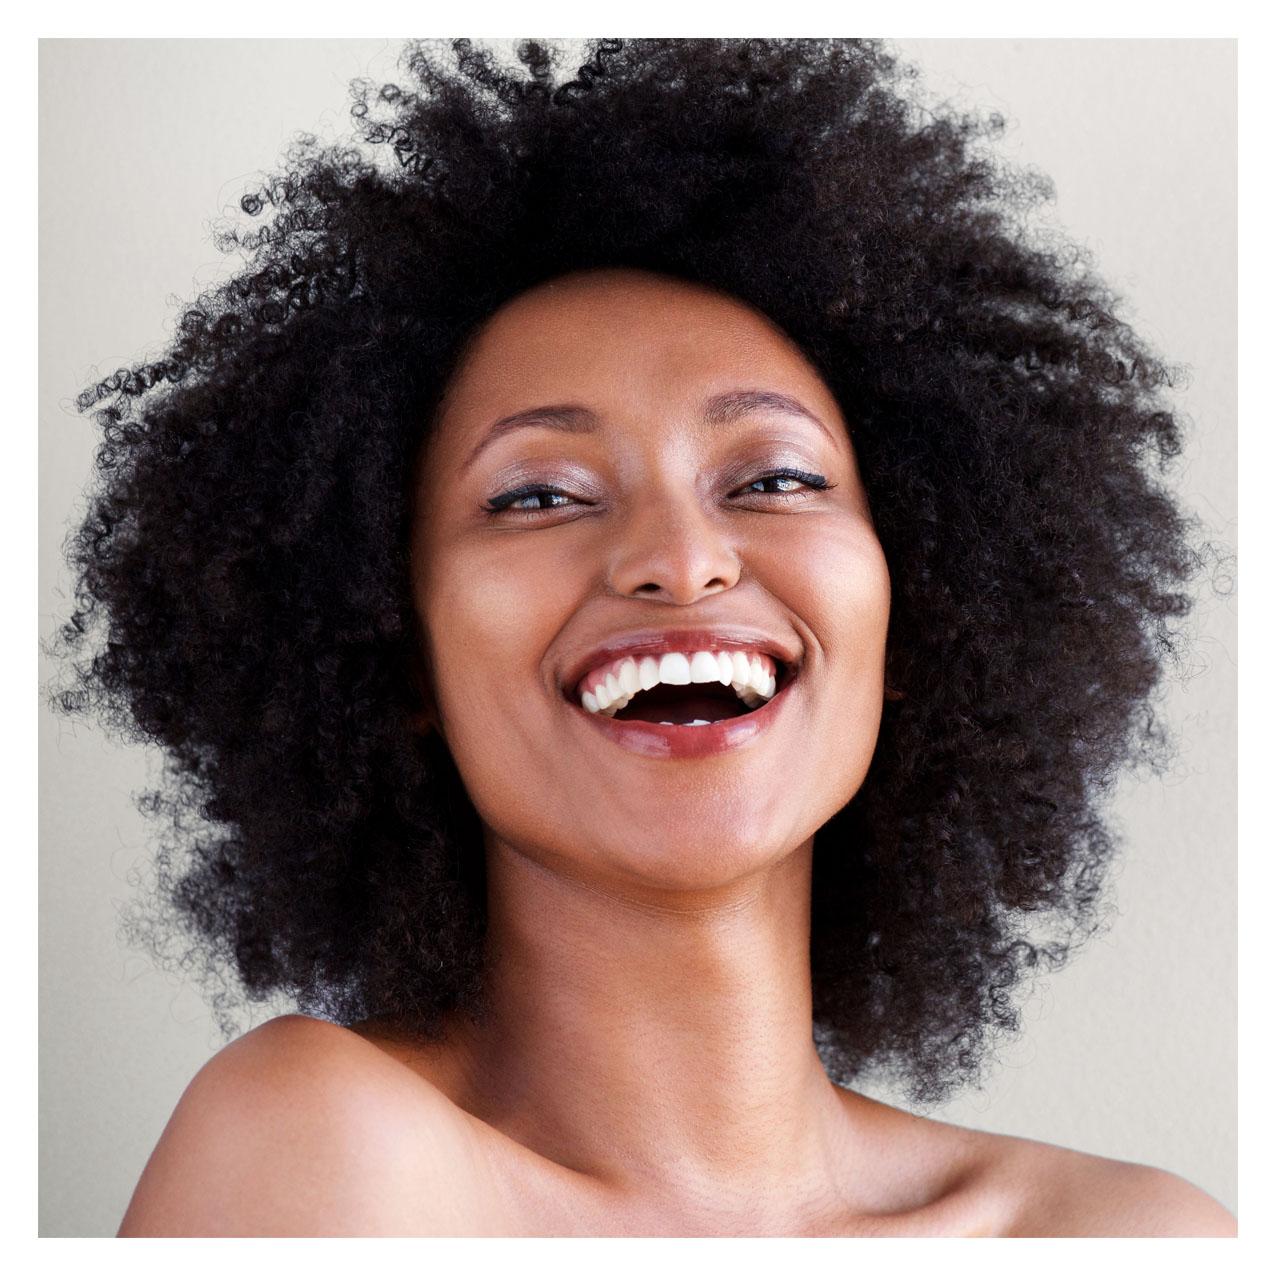 Skin Spa Facials I Vanilla Sugar Face Body Day Spa I Peoria Il Vanilla Sugar Day Spa Services L Peoria Illinois